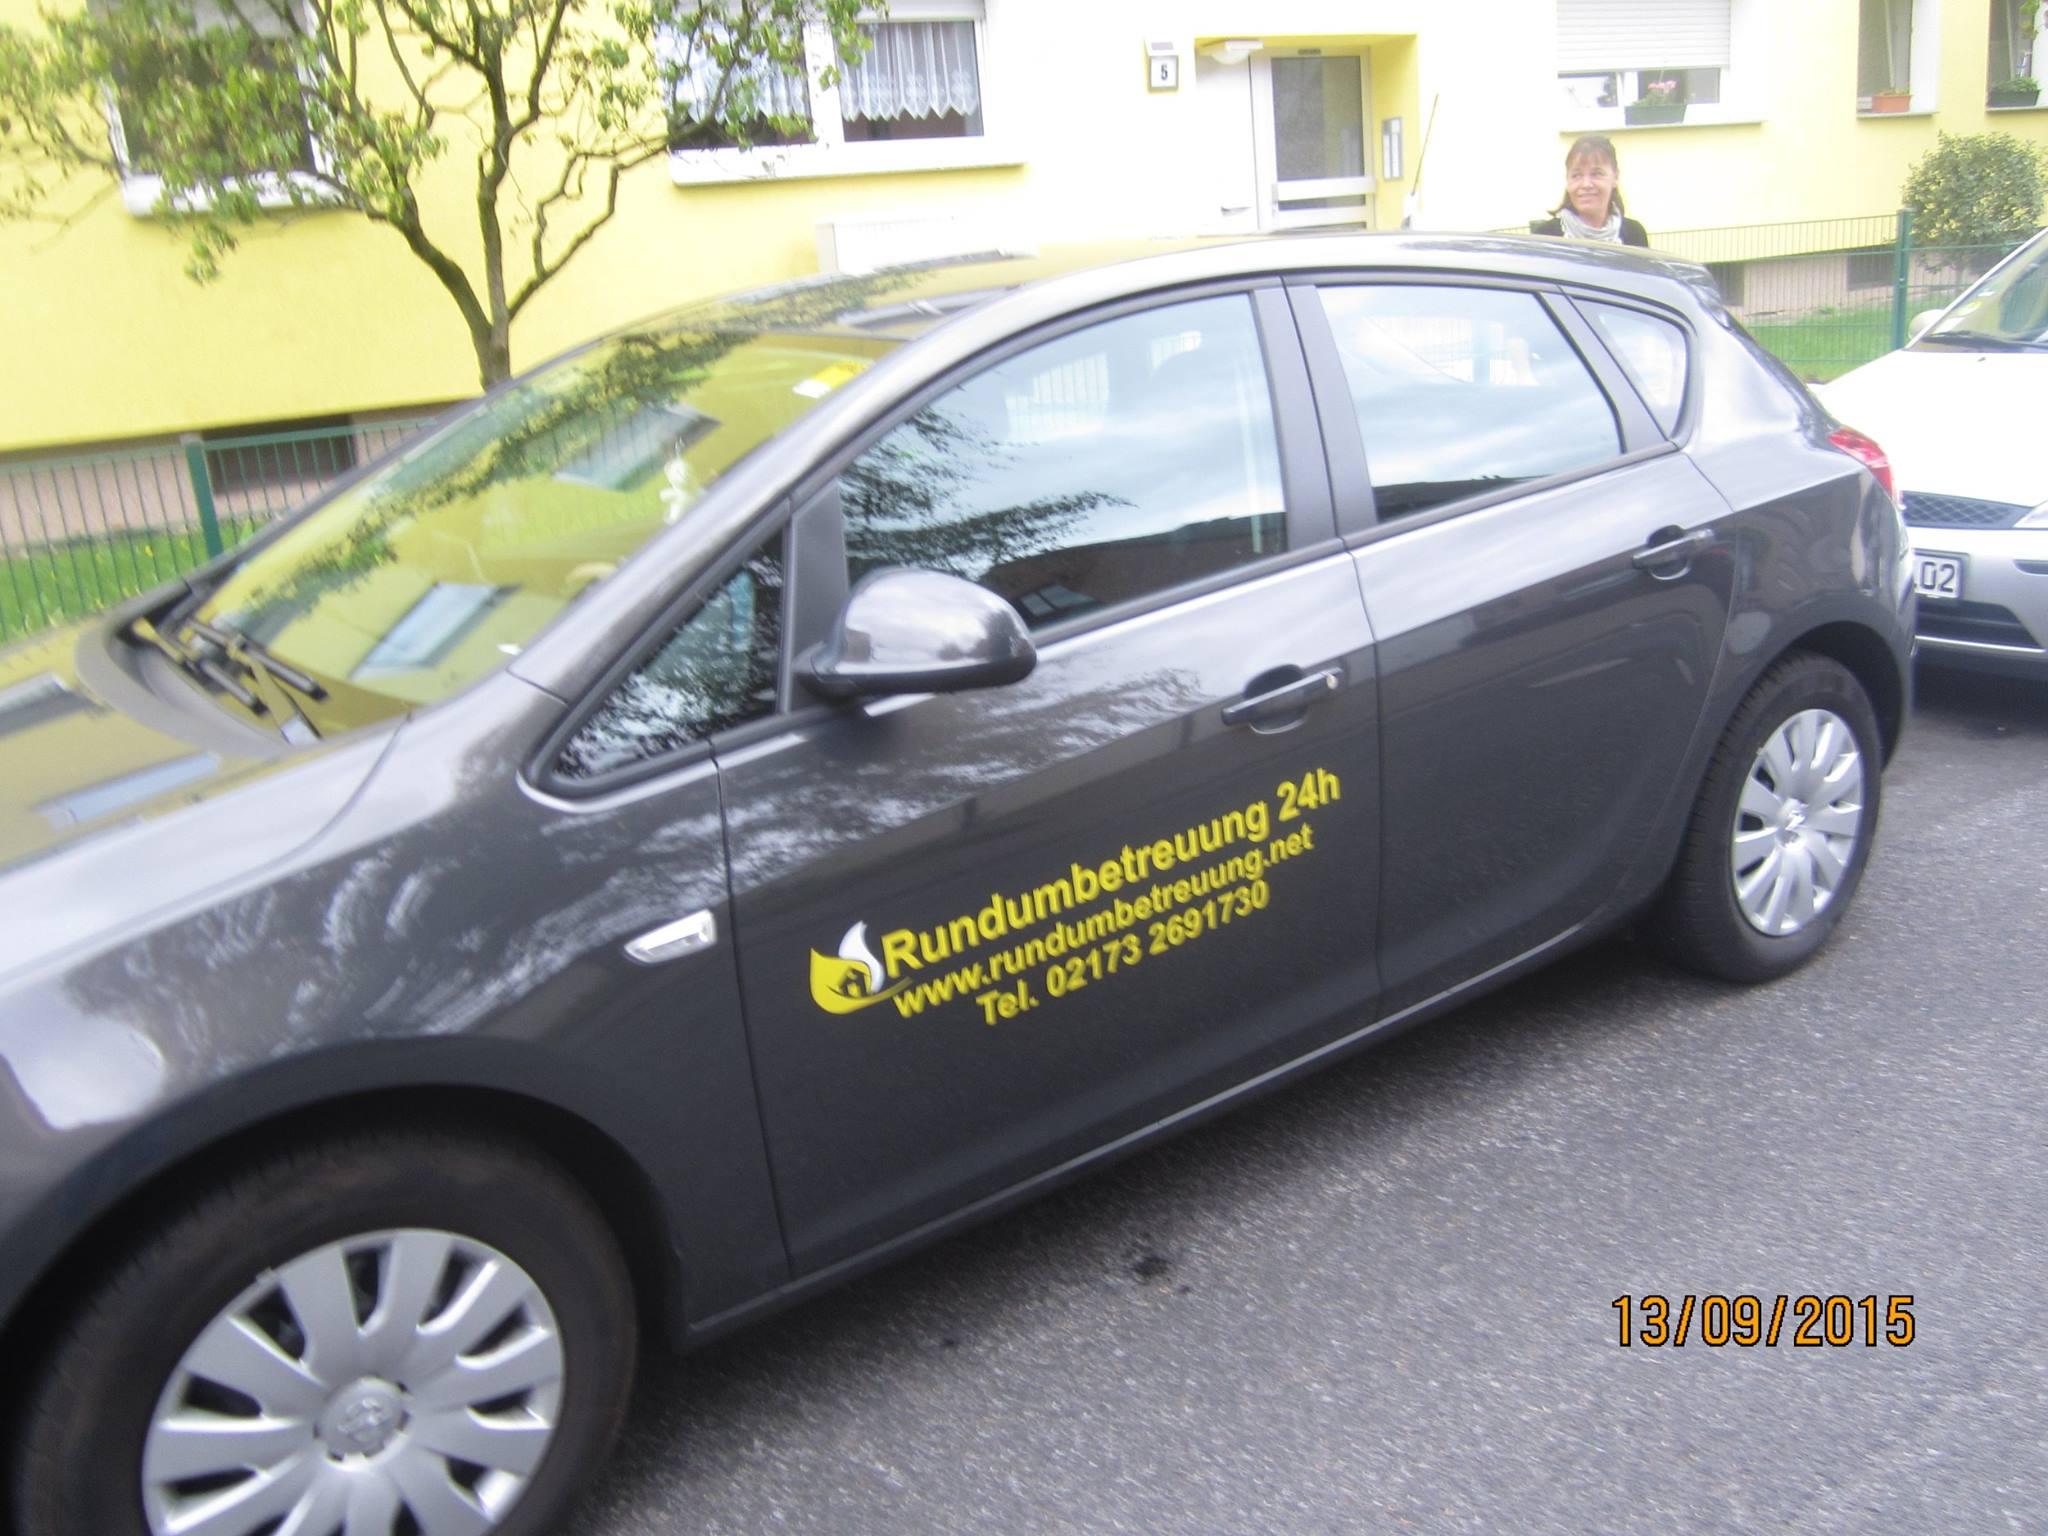 Altenpflege Rundumbetreuung Lothar Kniffel